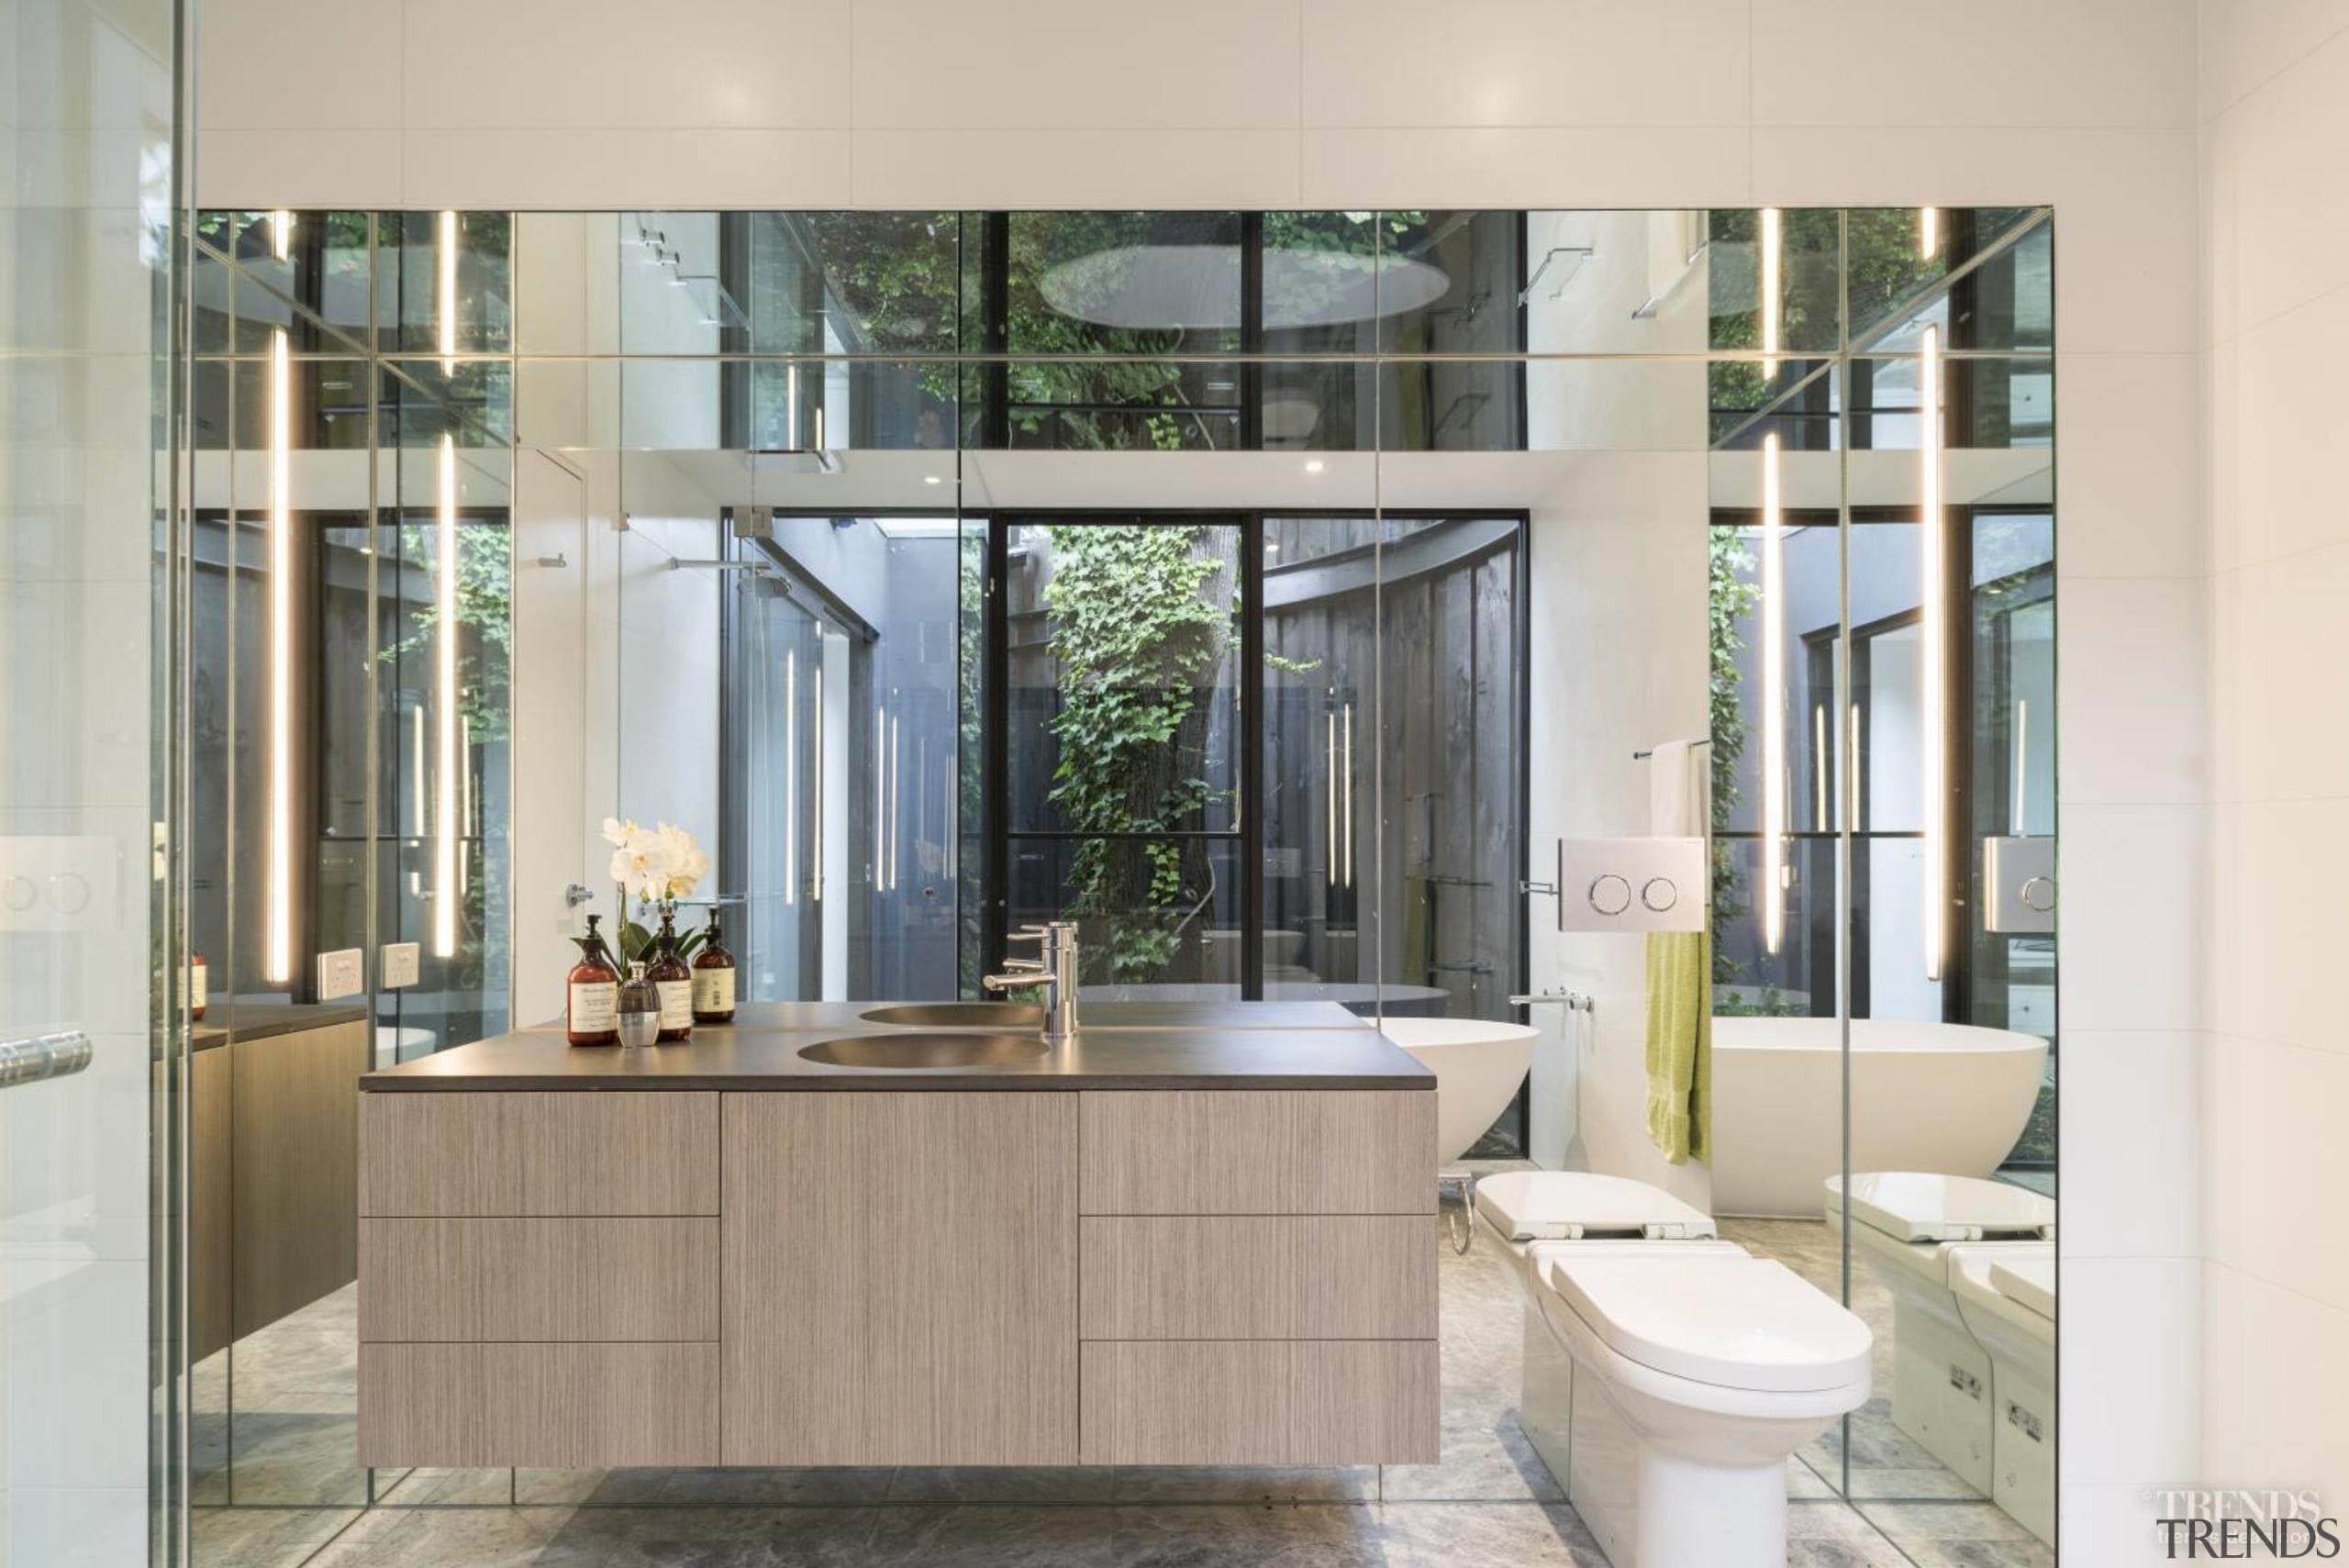 Look twice – most of this image is bathroom, interior design, window, gray